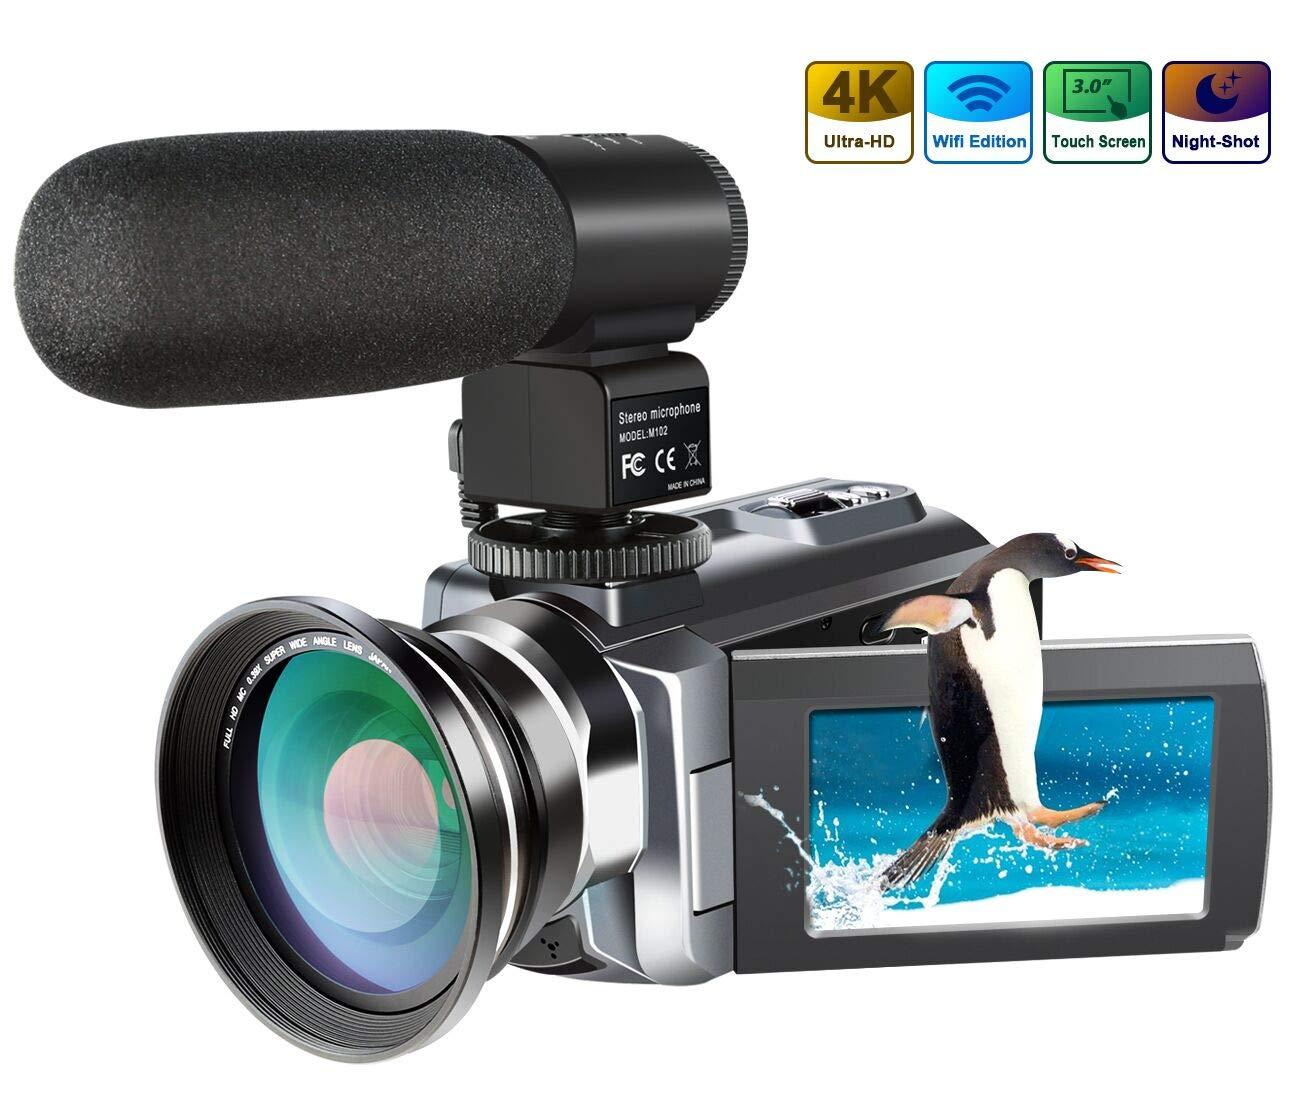 Top 14 Best 4k Camcorder Under 500 Buying Guide 2020